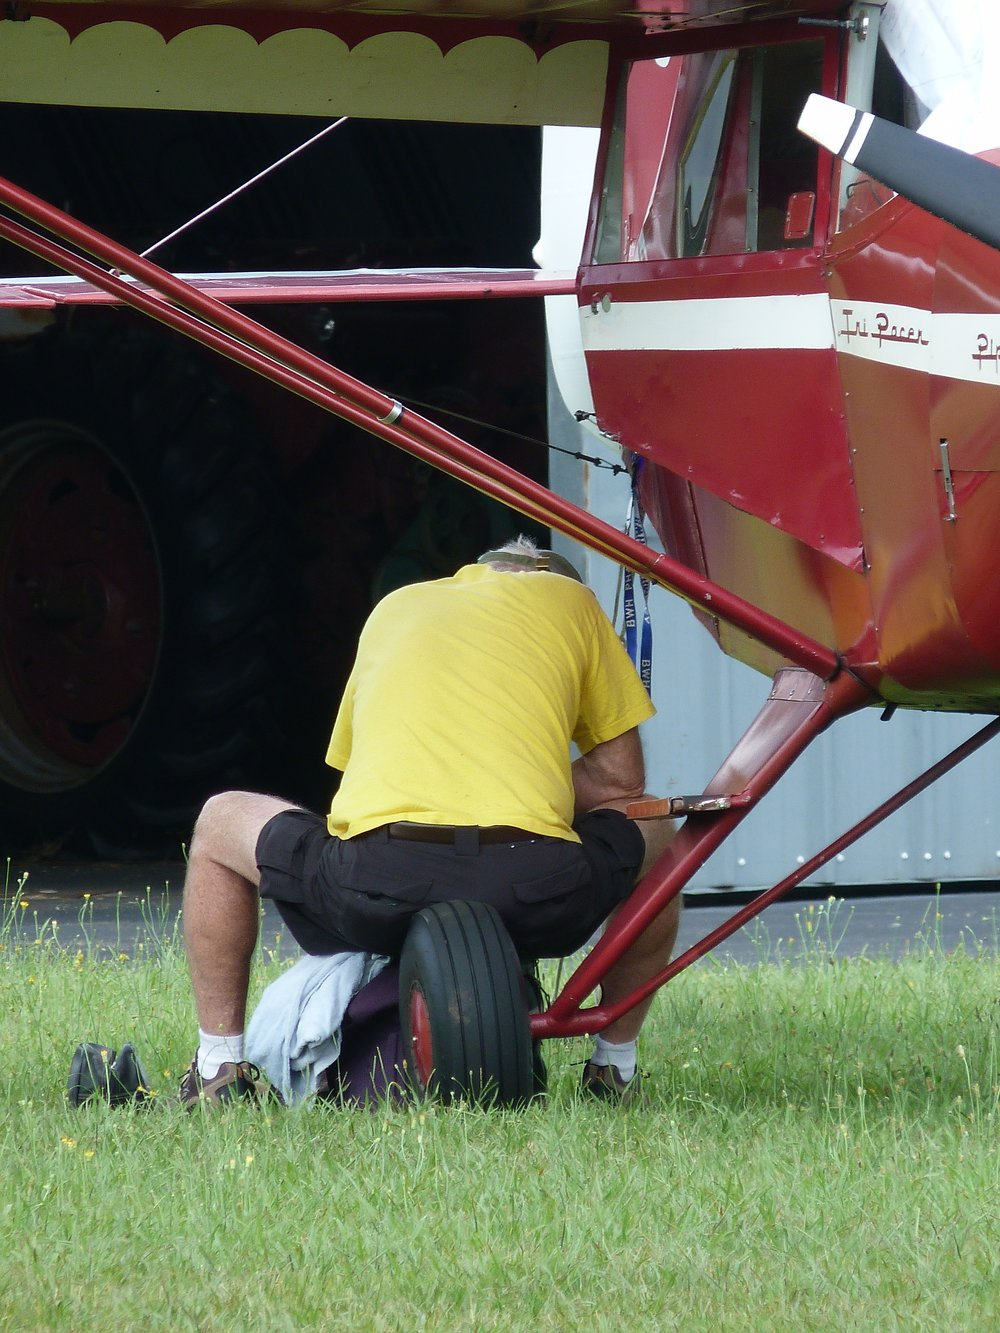 David Inspecting His Brakes